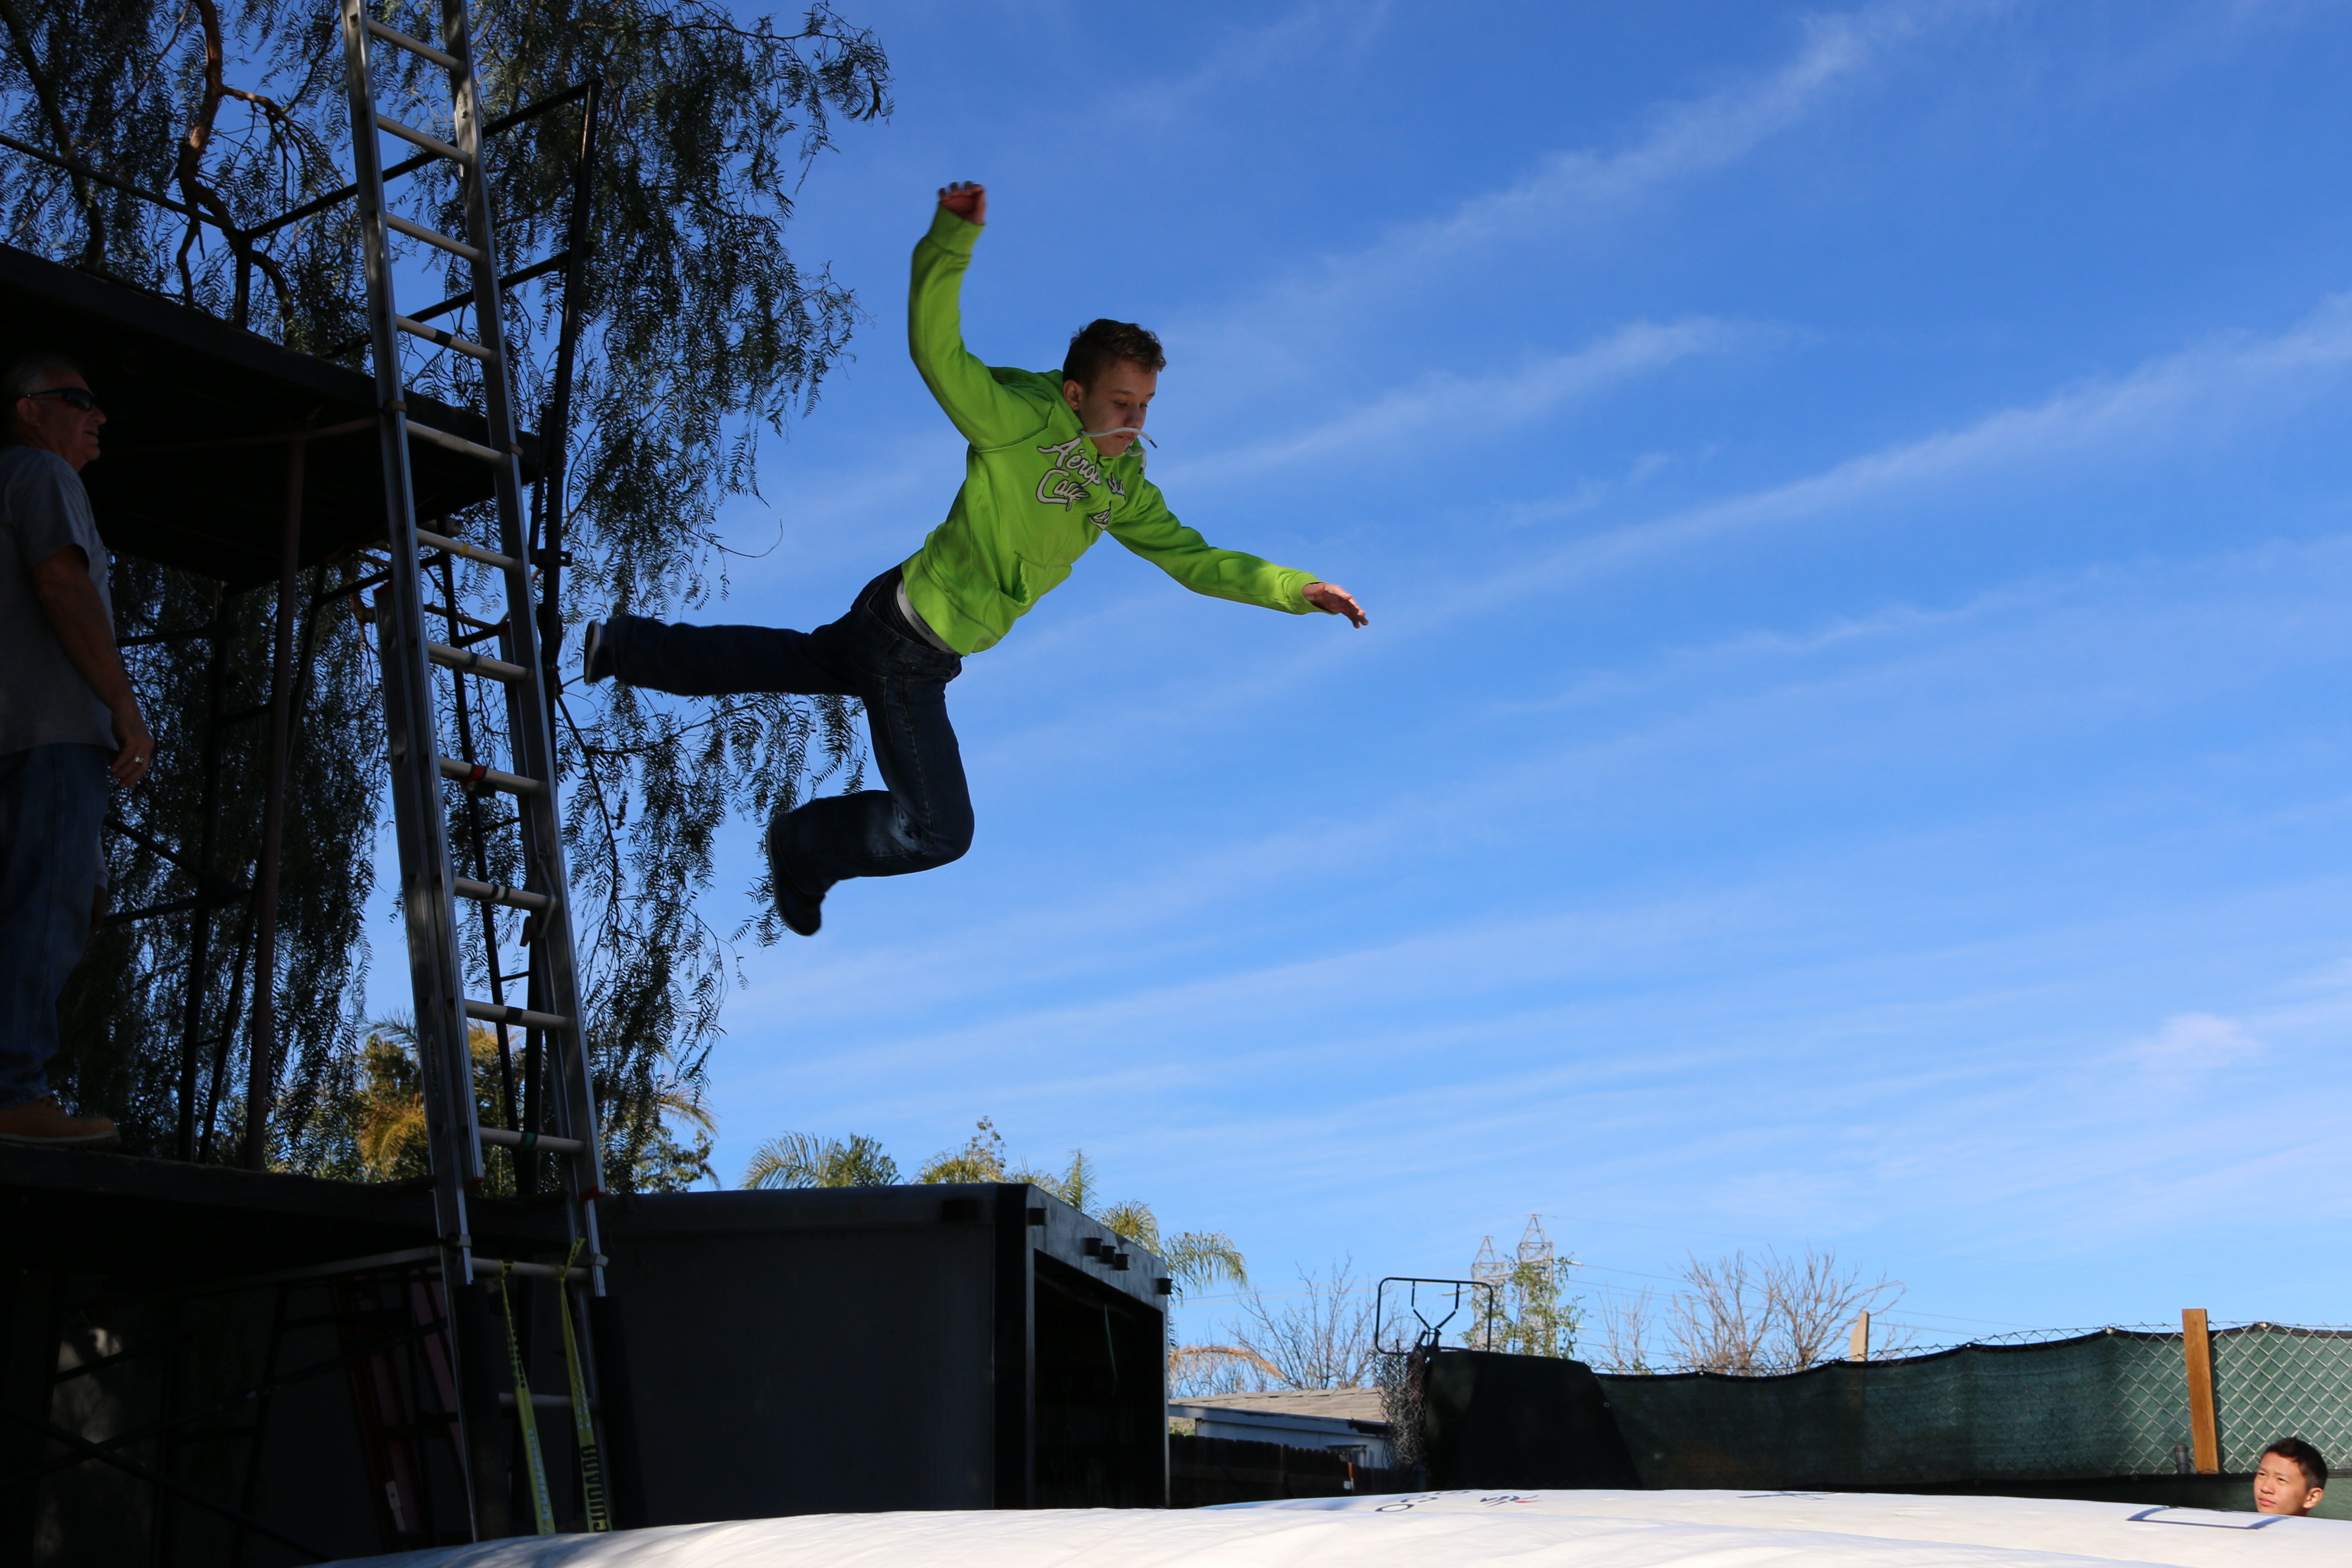 Carsen Warner doing falls jump - Stunt Kids